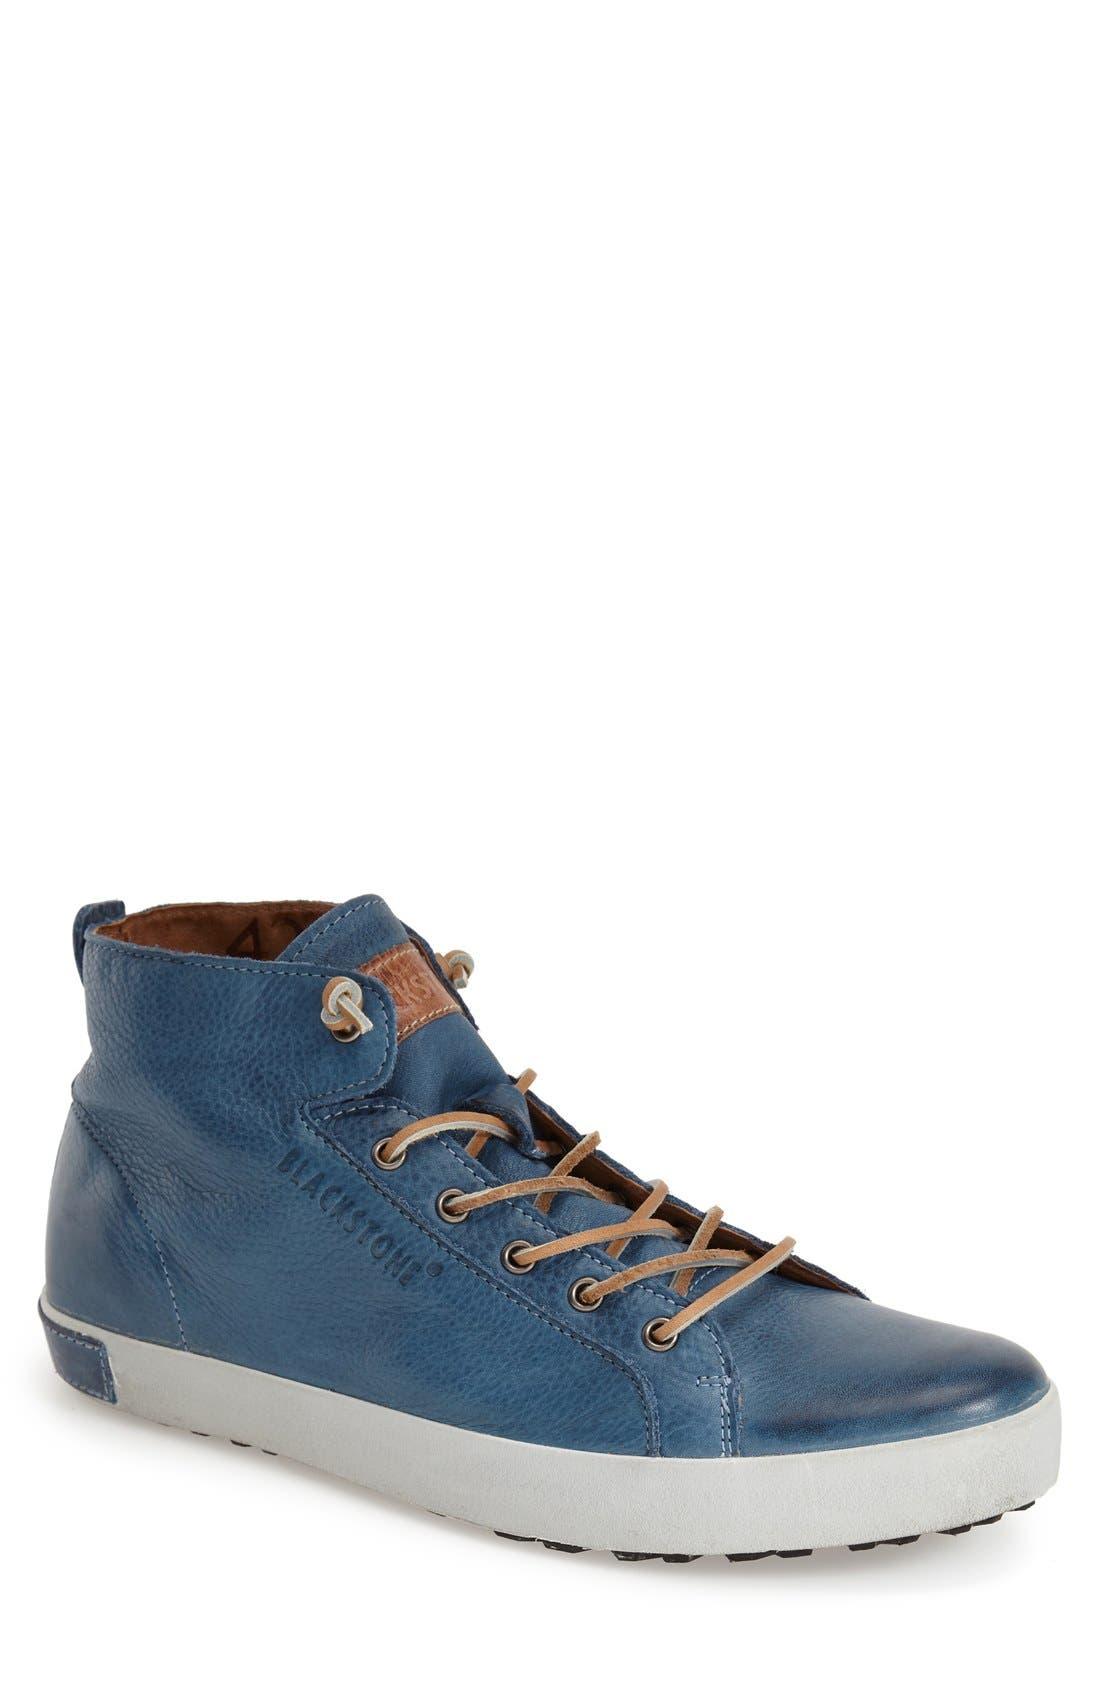 'JM03' Sneaker,                         Main,                         color, Light Indigo Leather